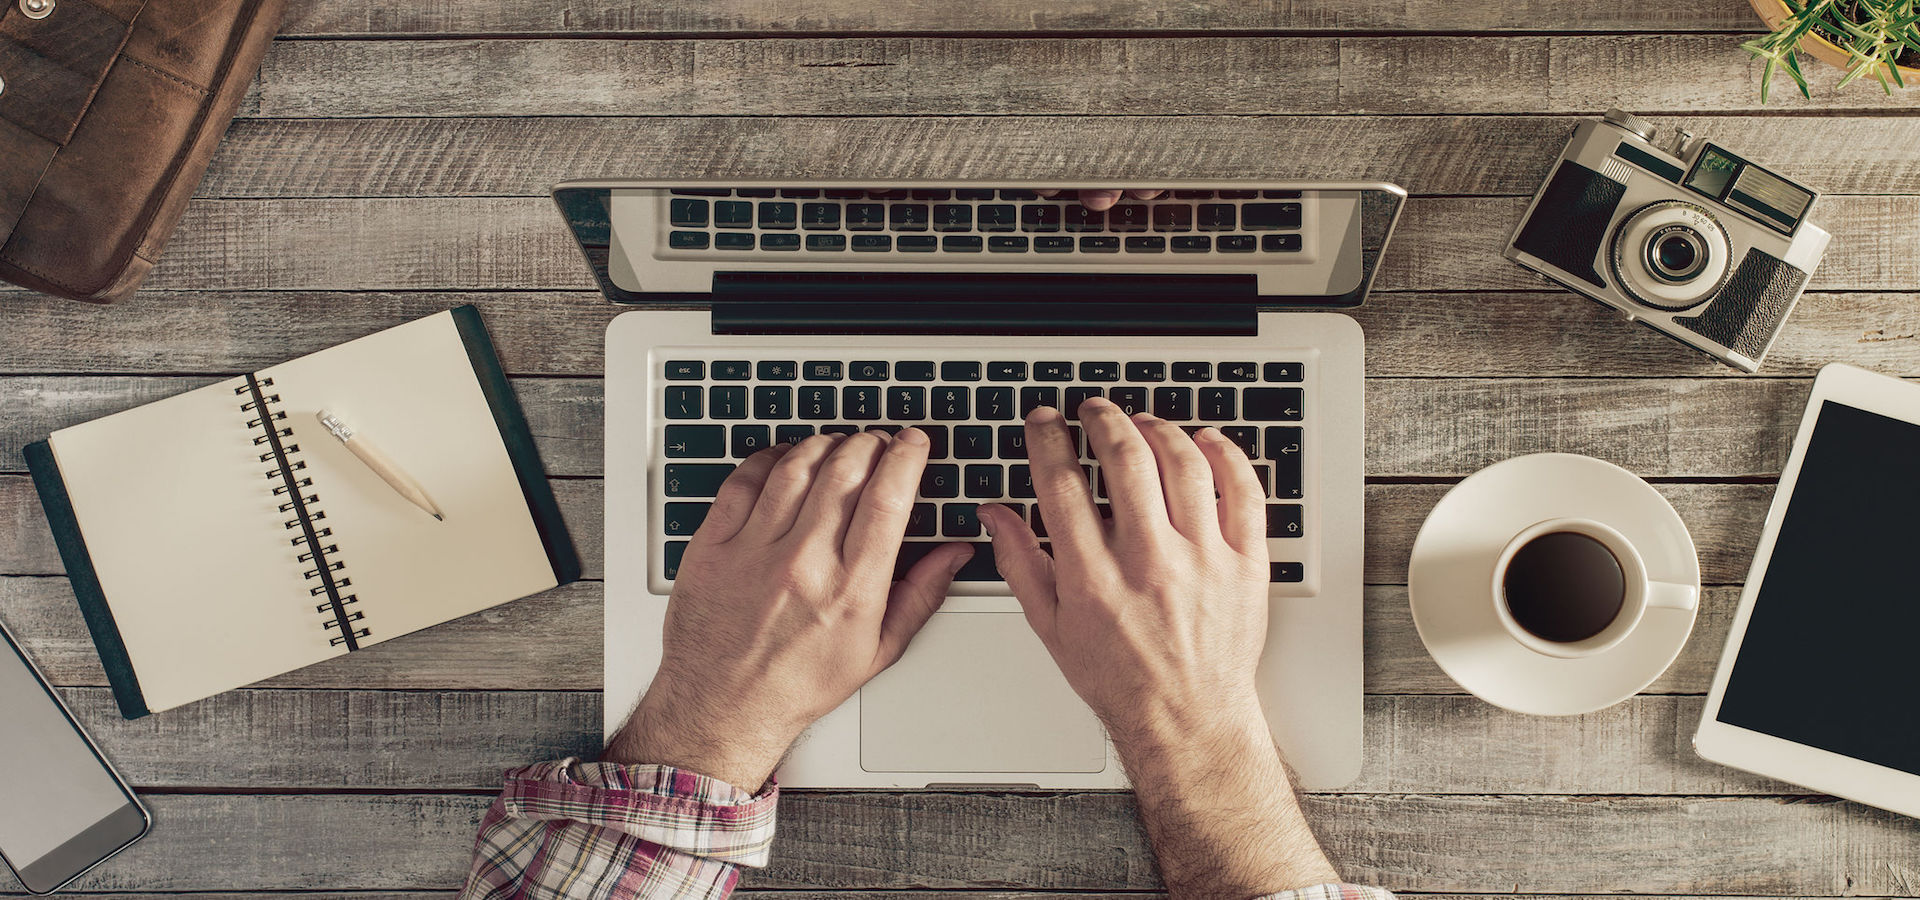 ways to overcome blogger's block blog.jpg